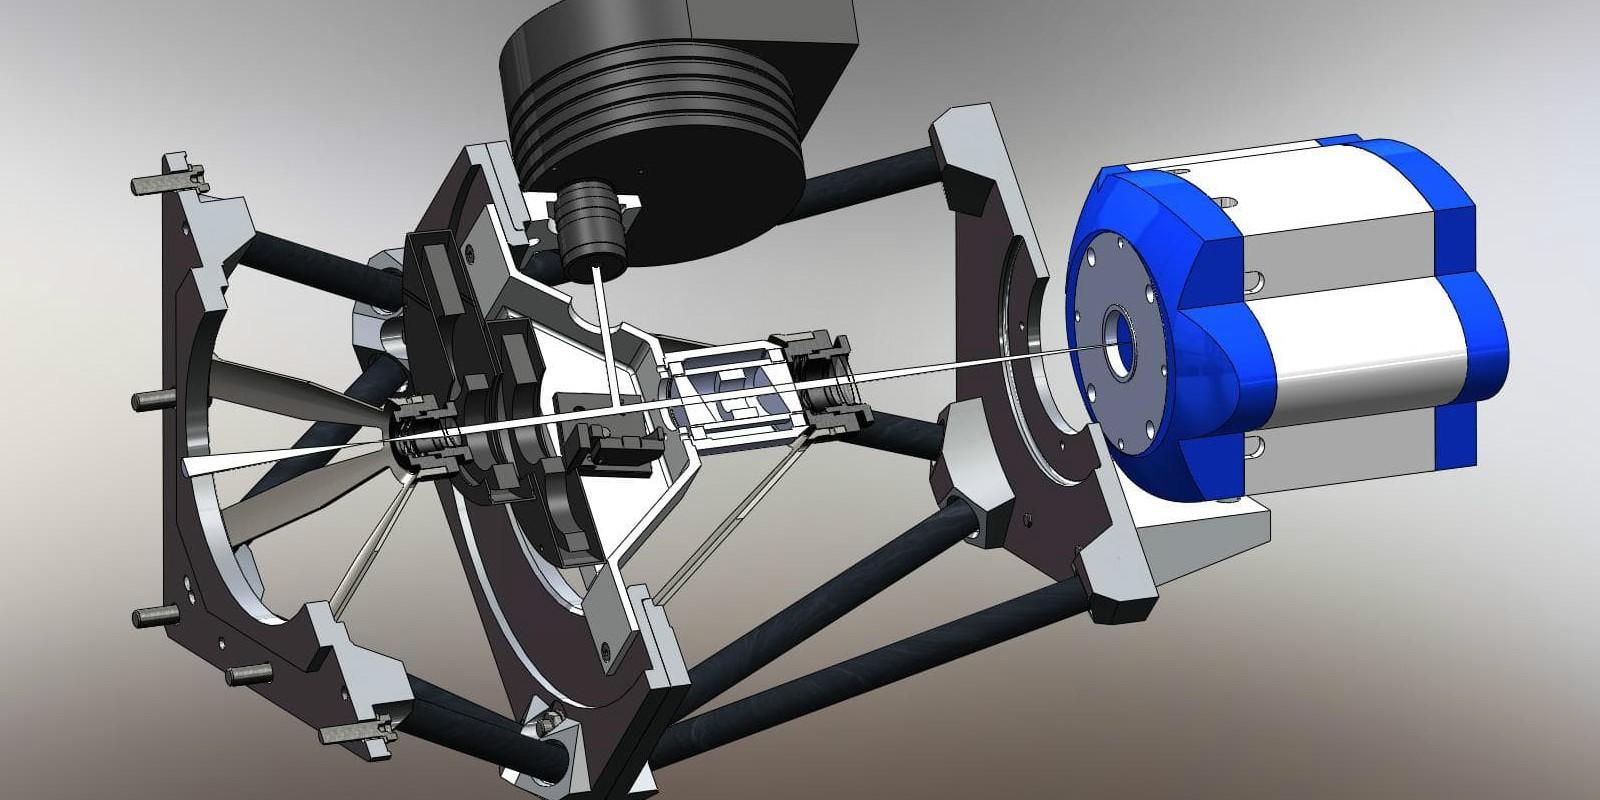 Fastcam_astronomy_instruments_Canary_Islands_IDOM_ADA_2_